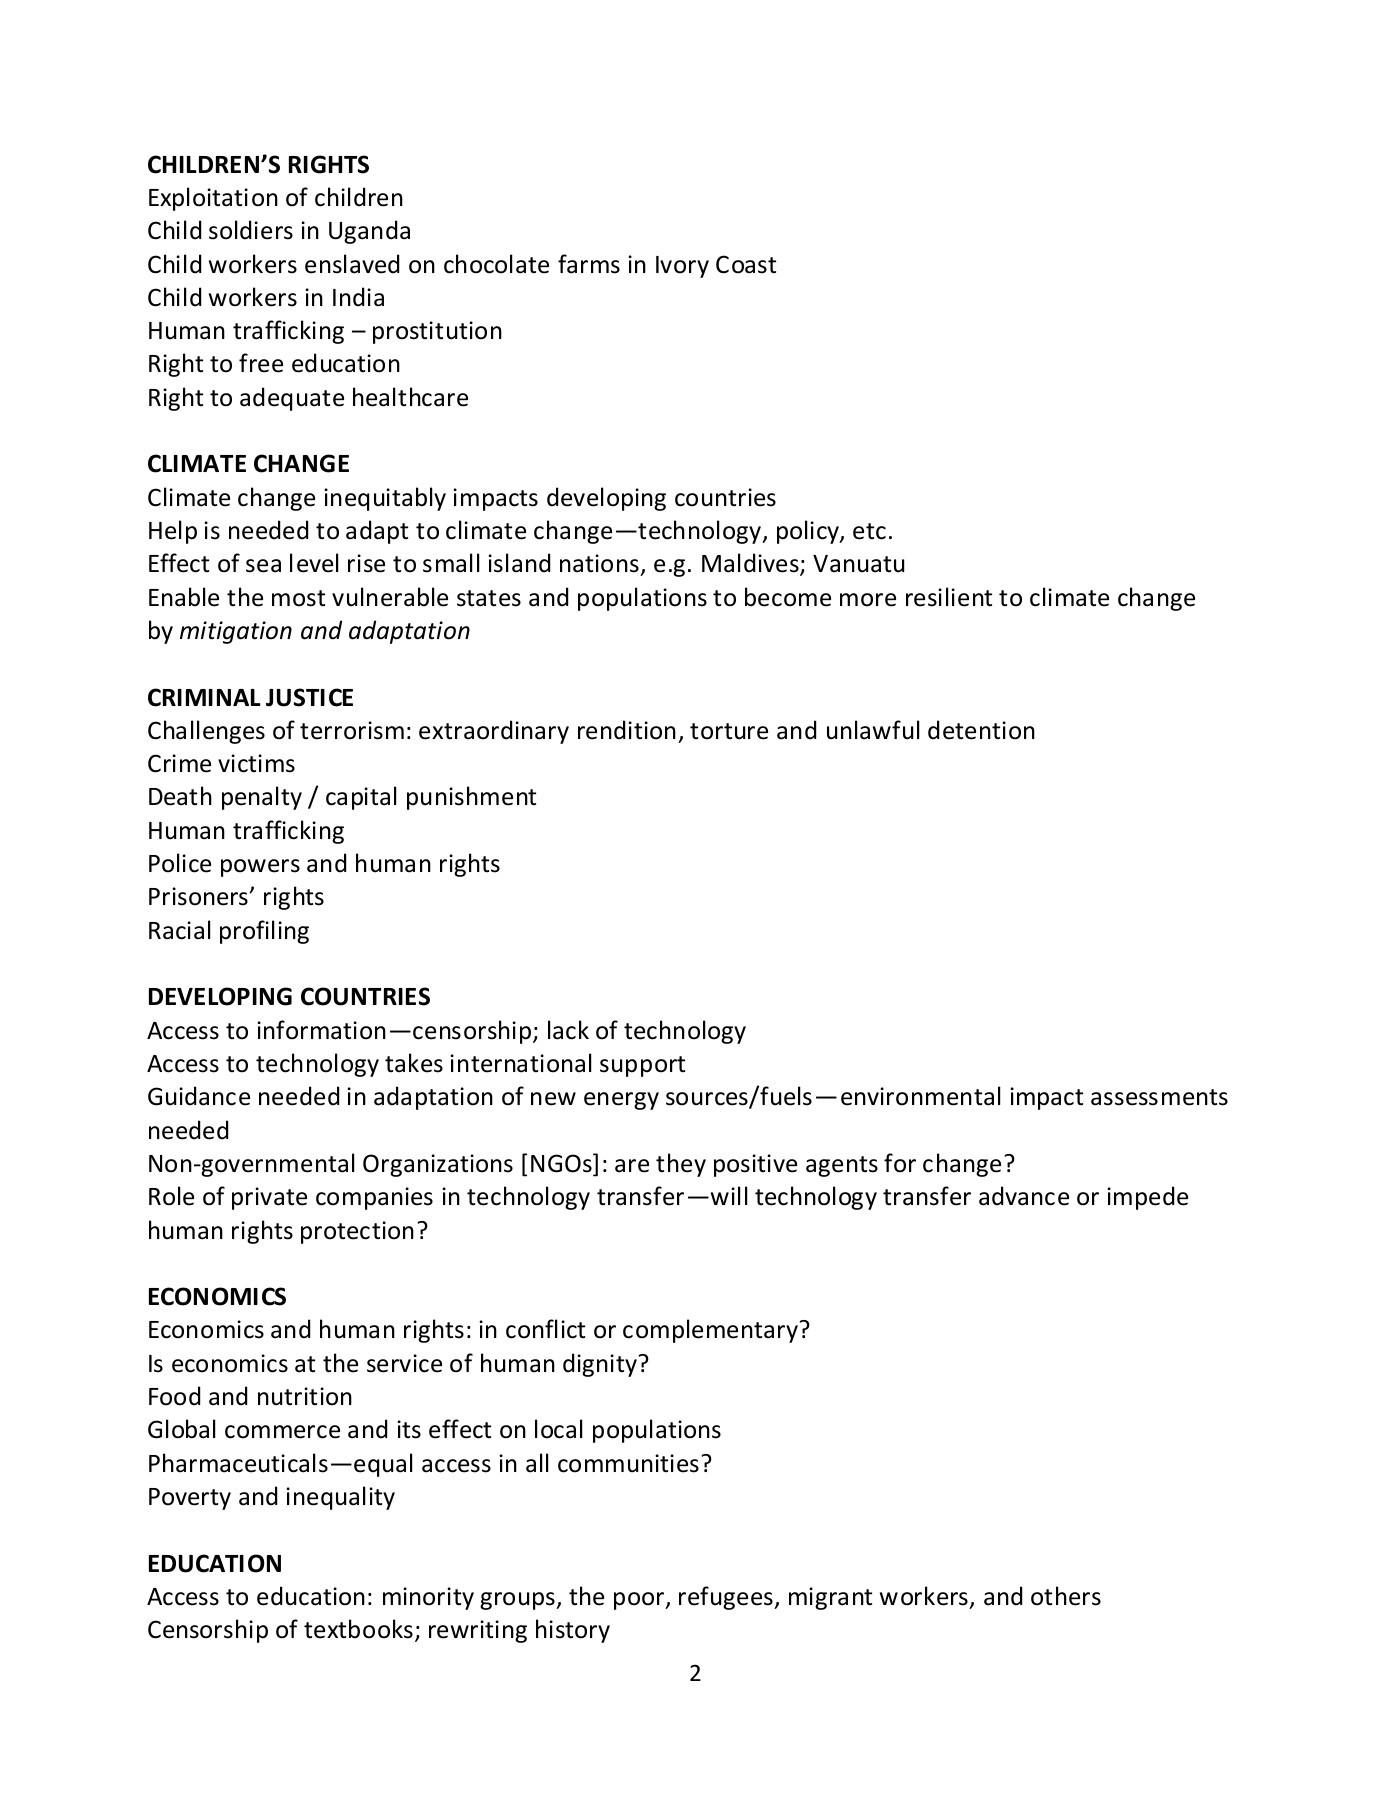 Human services term paper